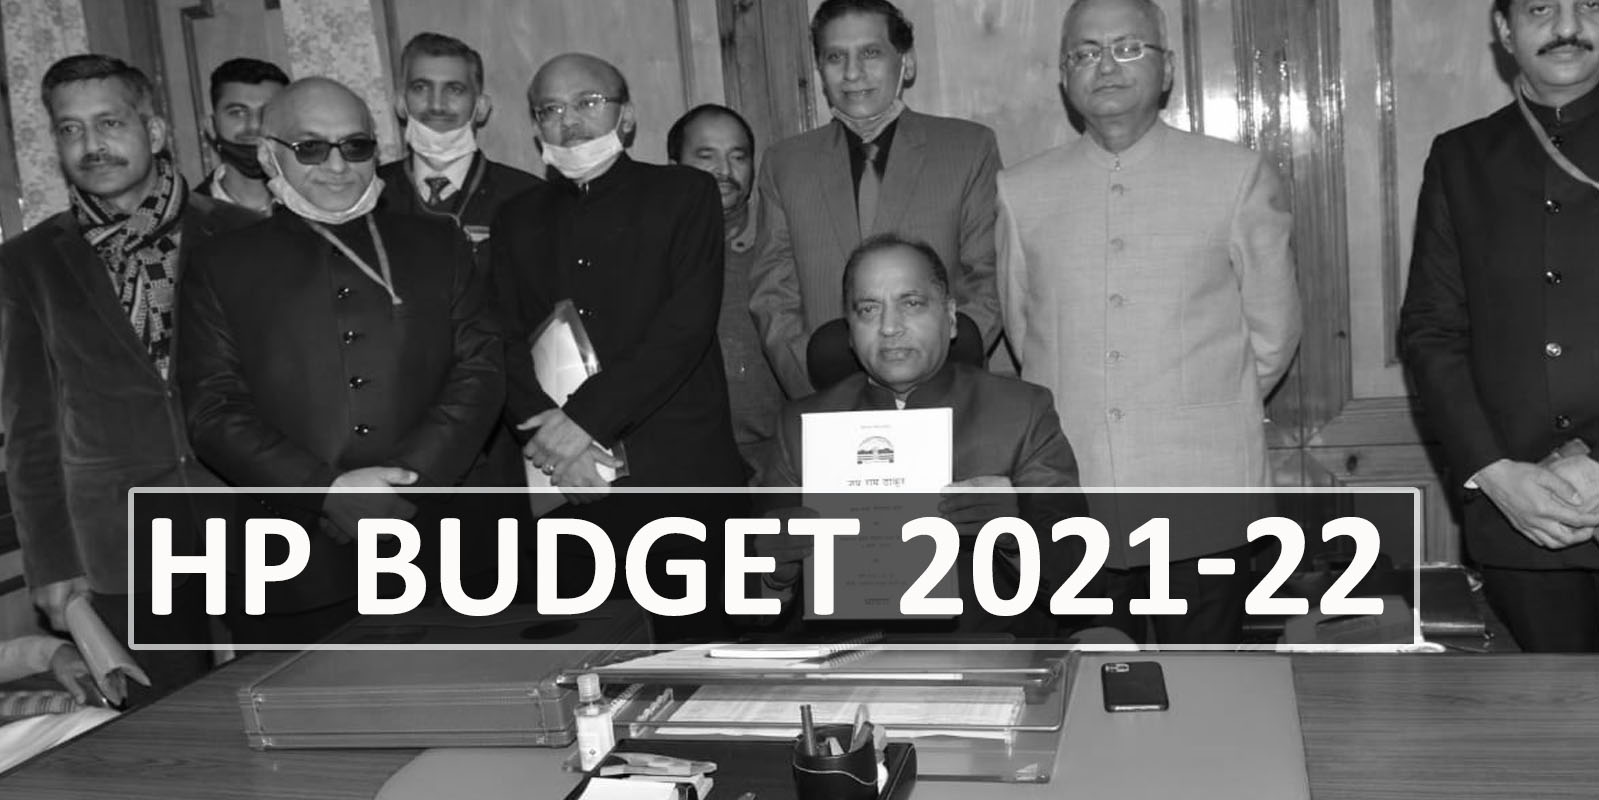 HP Budget 2021-22 PDF